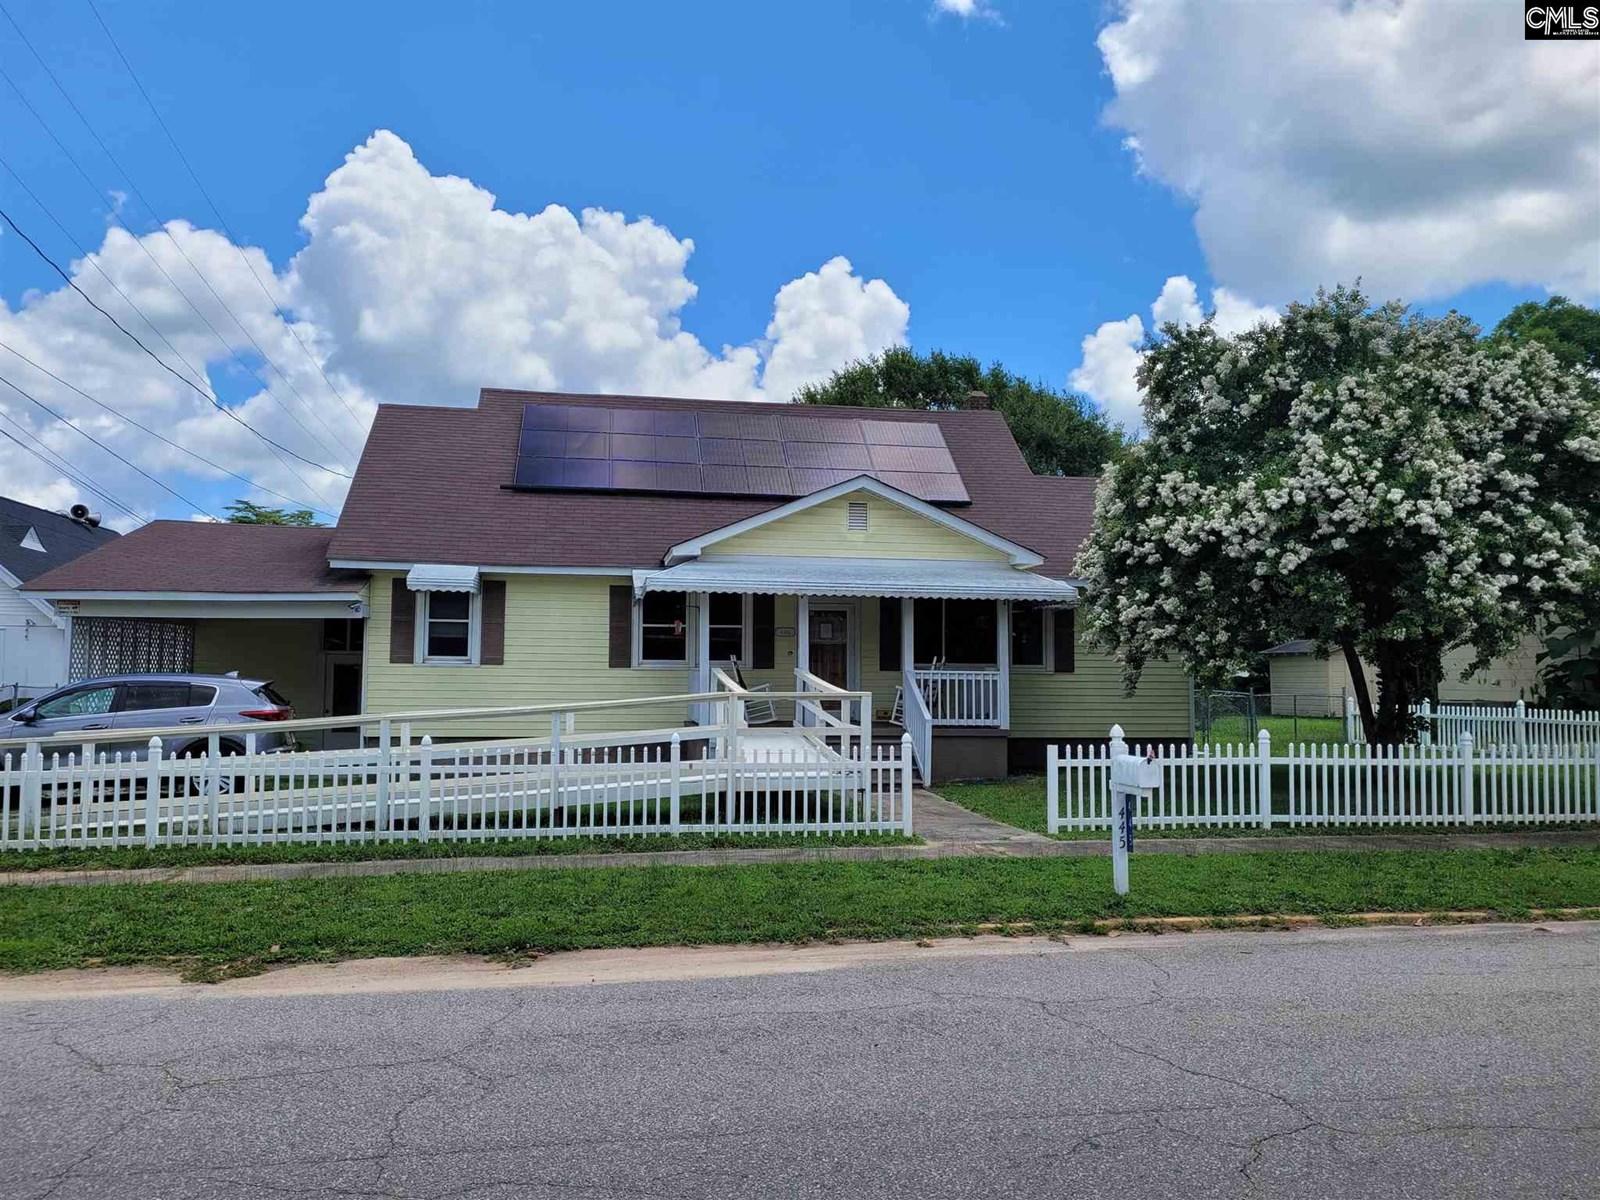 Historic Winnsboro, SC 4Bed/2Bath Home on Fenced Corner Lot